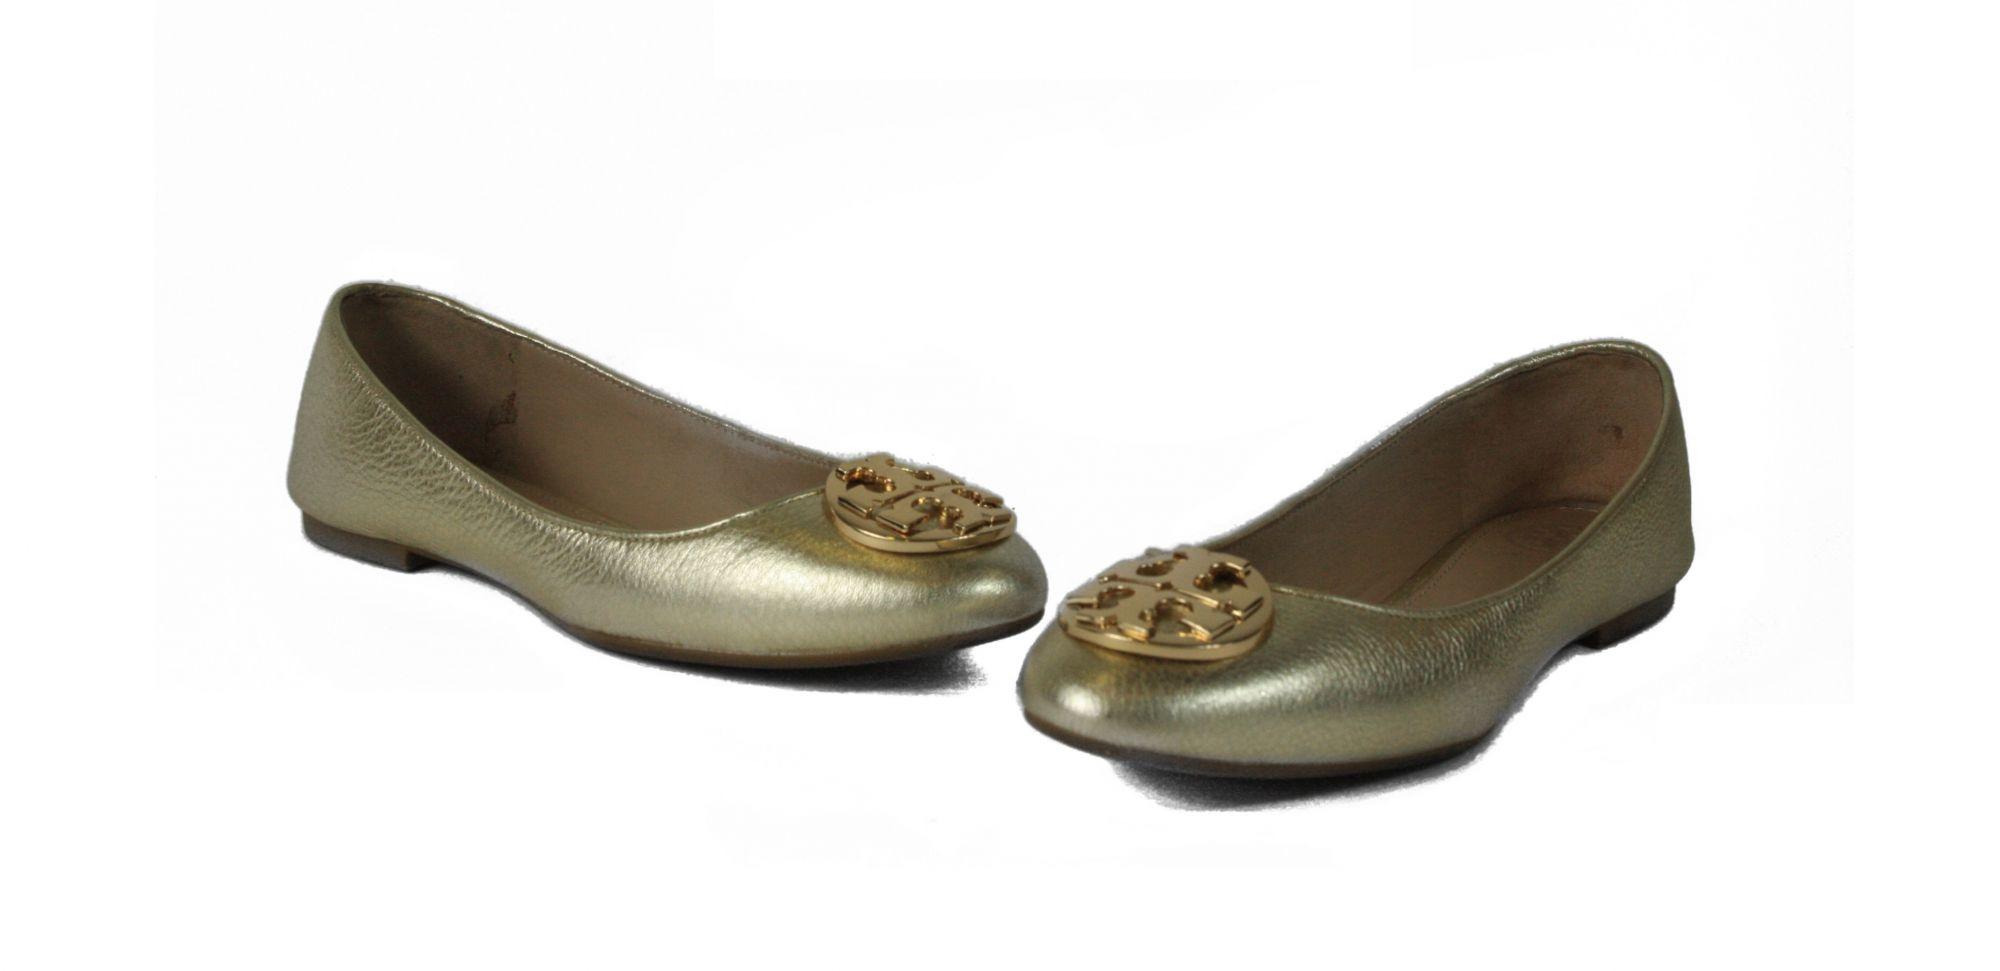 Minnie Travel Ballet Flat In Gold Metallic Leather